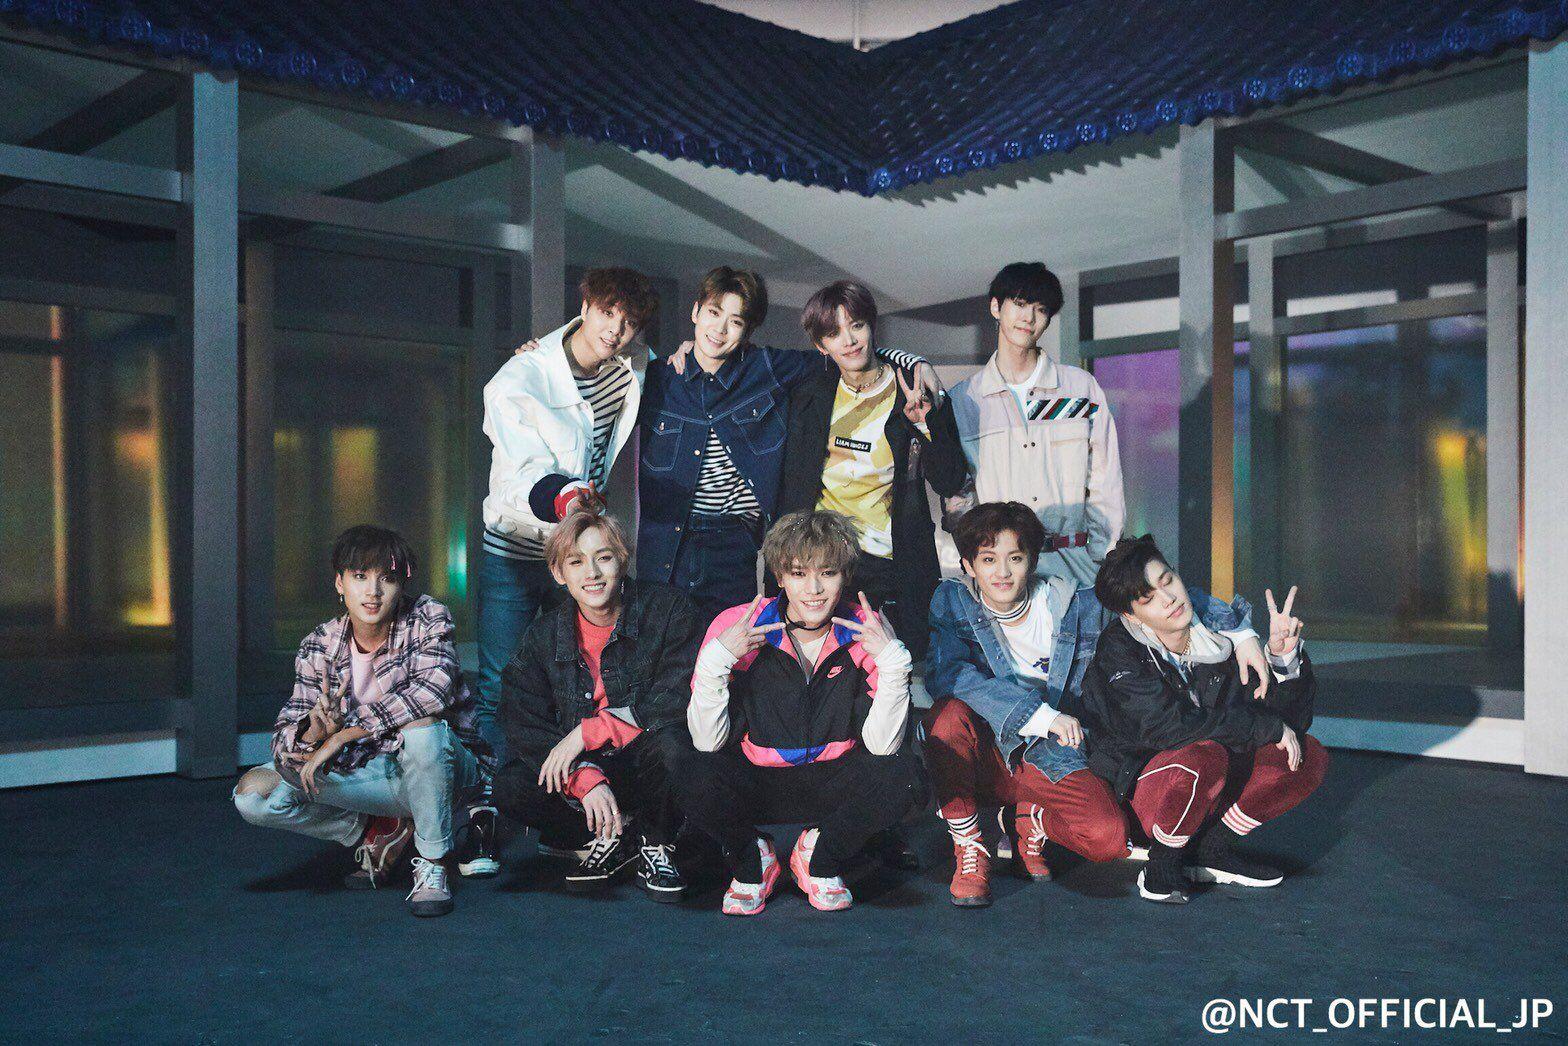 NCT 127 'Chain' — Group Shot #LeeTaeyong #KimDoyoung # ...